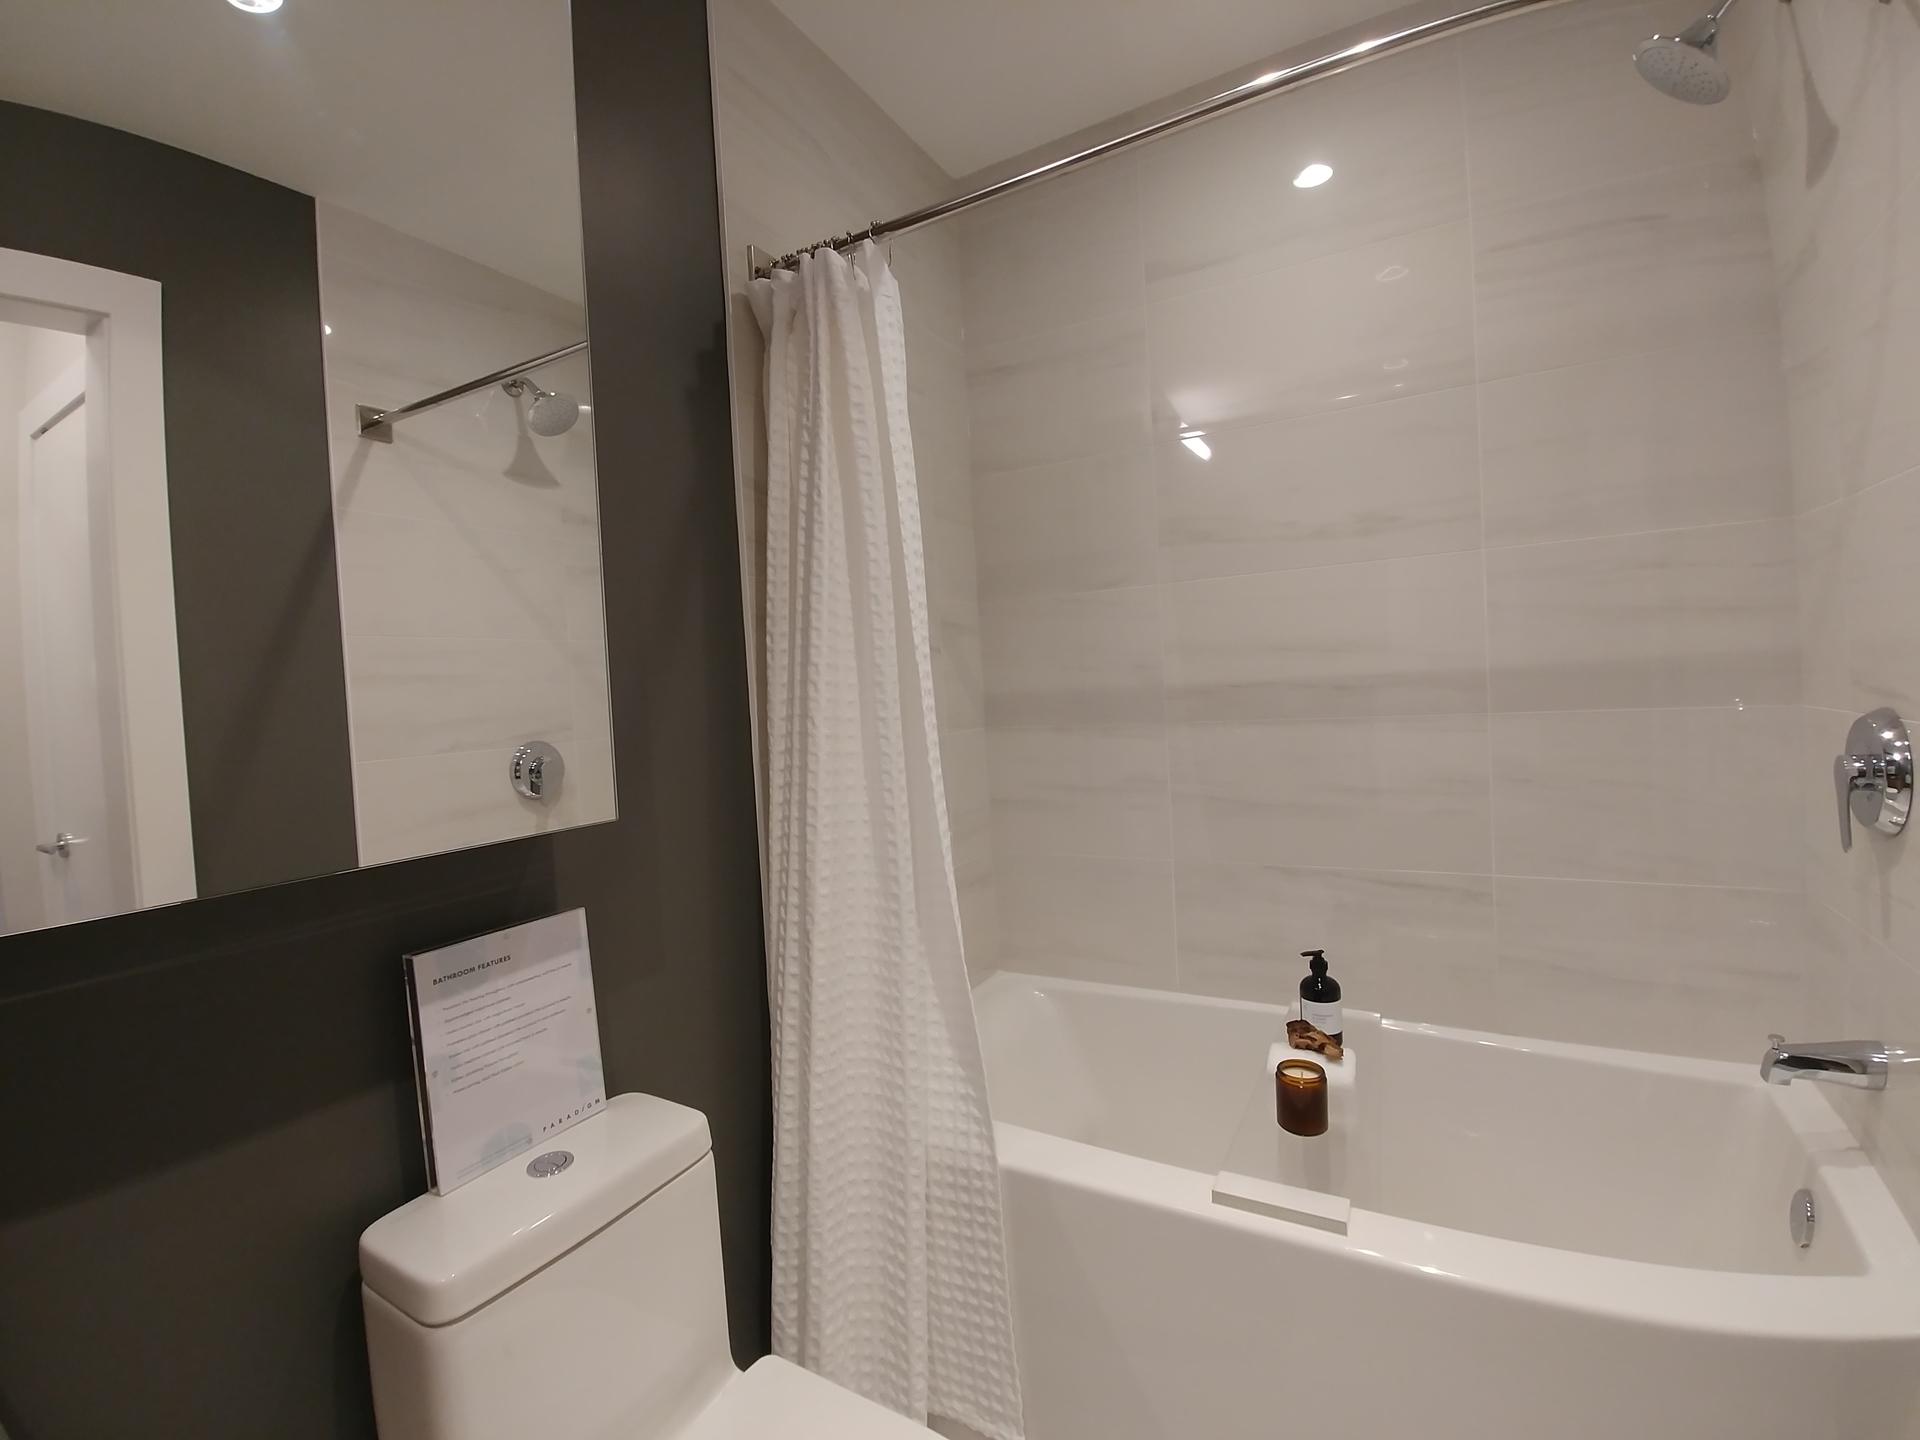 paradigm-bathroom-light-colour-scheme at Paradigm ( River District, South Marine, Vancouver East)